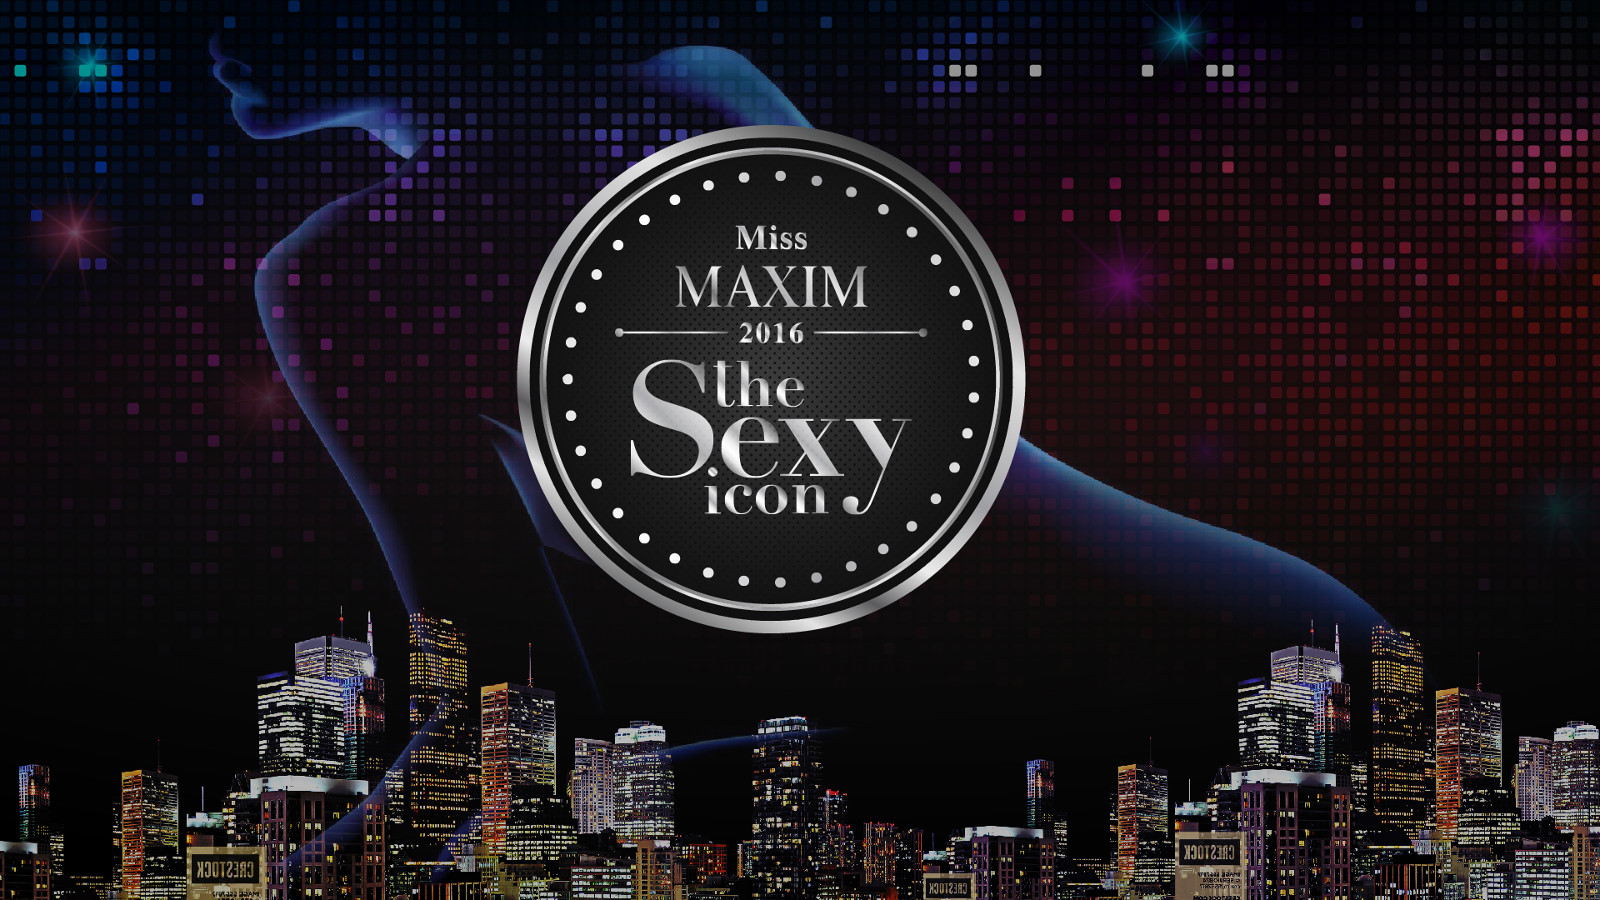 Miss MAXIM 2016 The Sexy Icon (MX91-MX100)